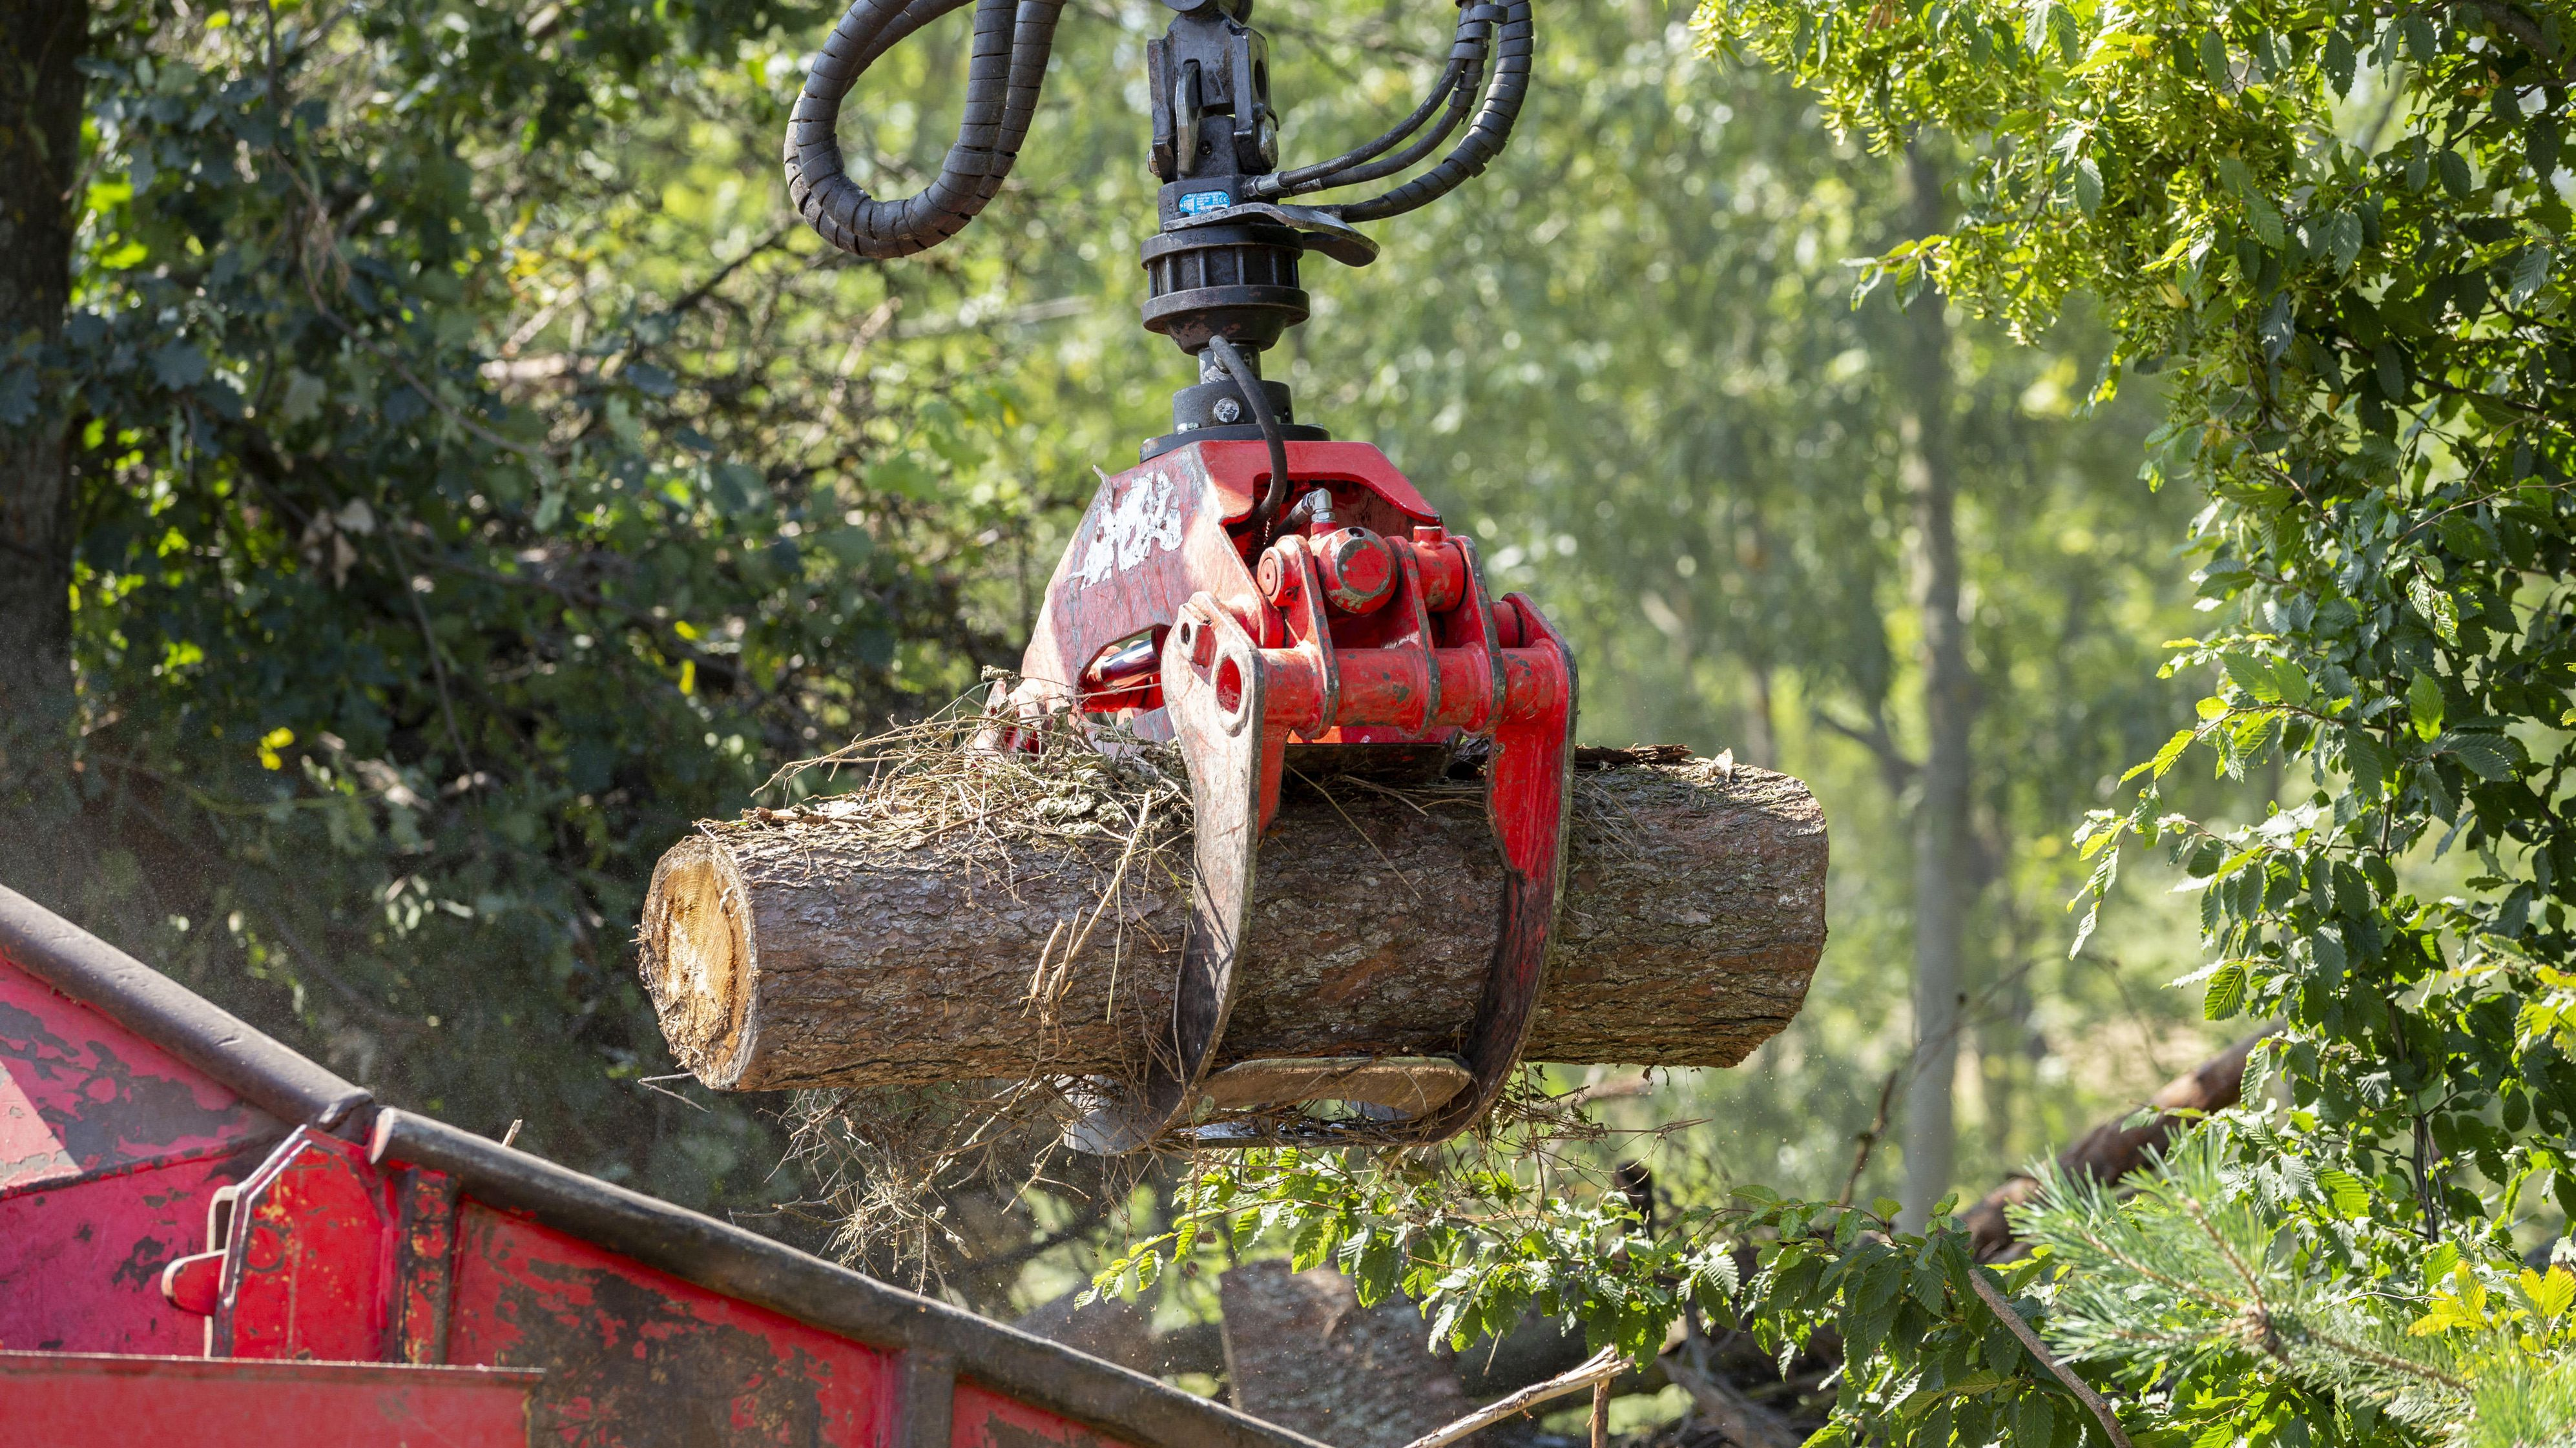 Käferholzbeseitigung mit Holzkran